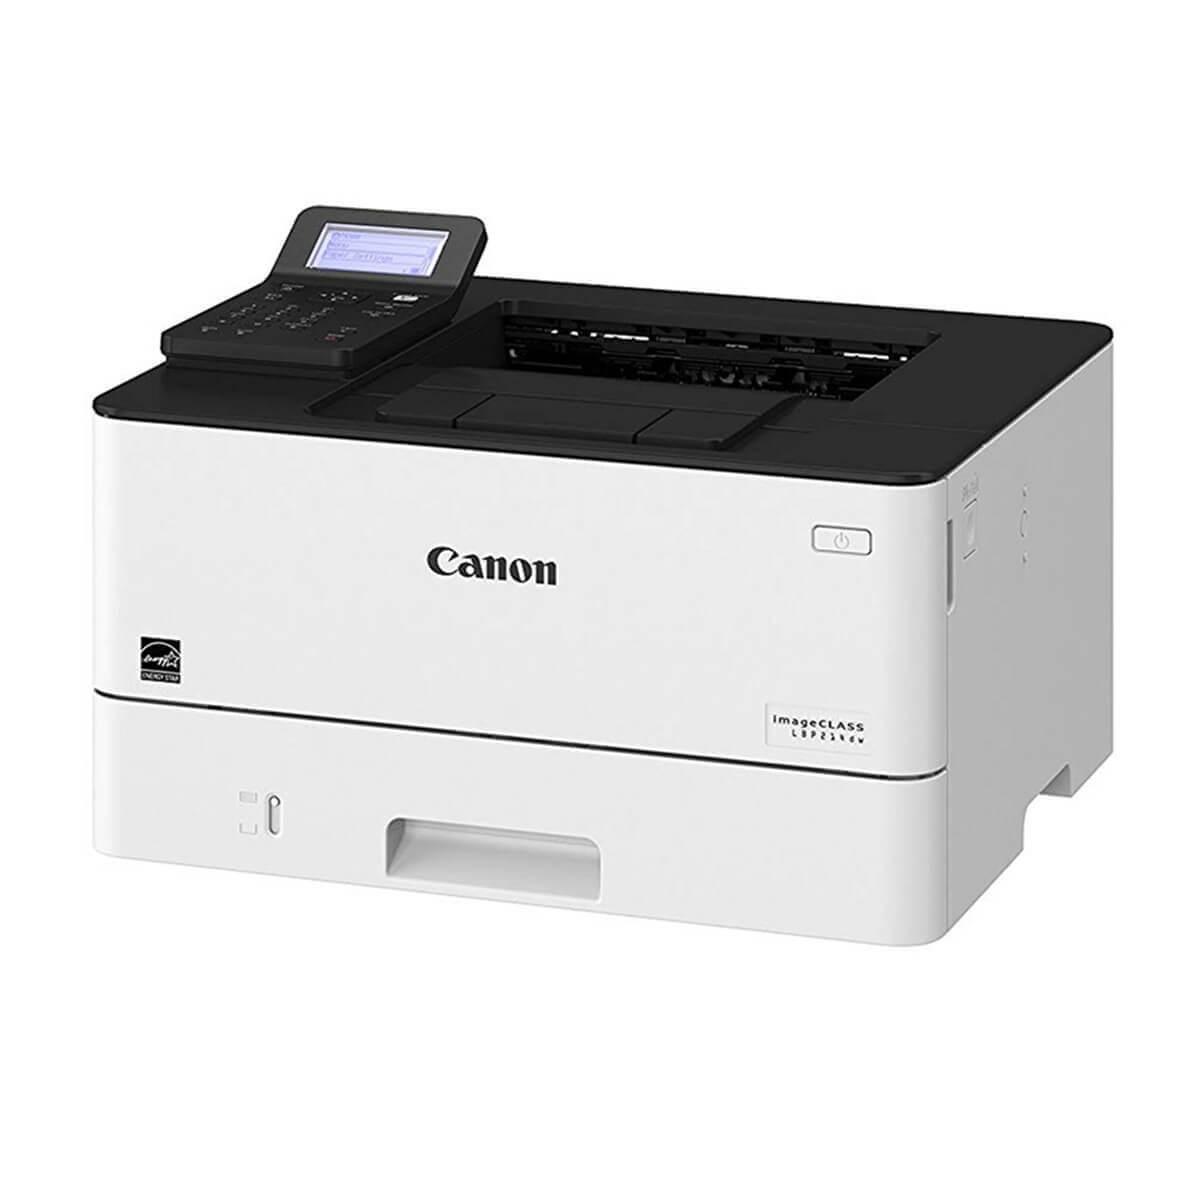 Impressora Convencional Canon I-sensys Lbp214dw Laser Monocromática Usb, Ethernet e Wi-fi 110v